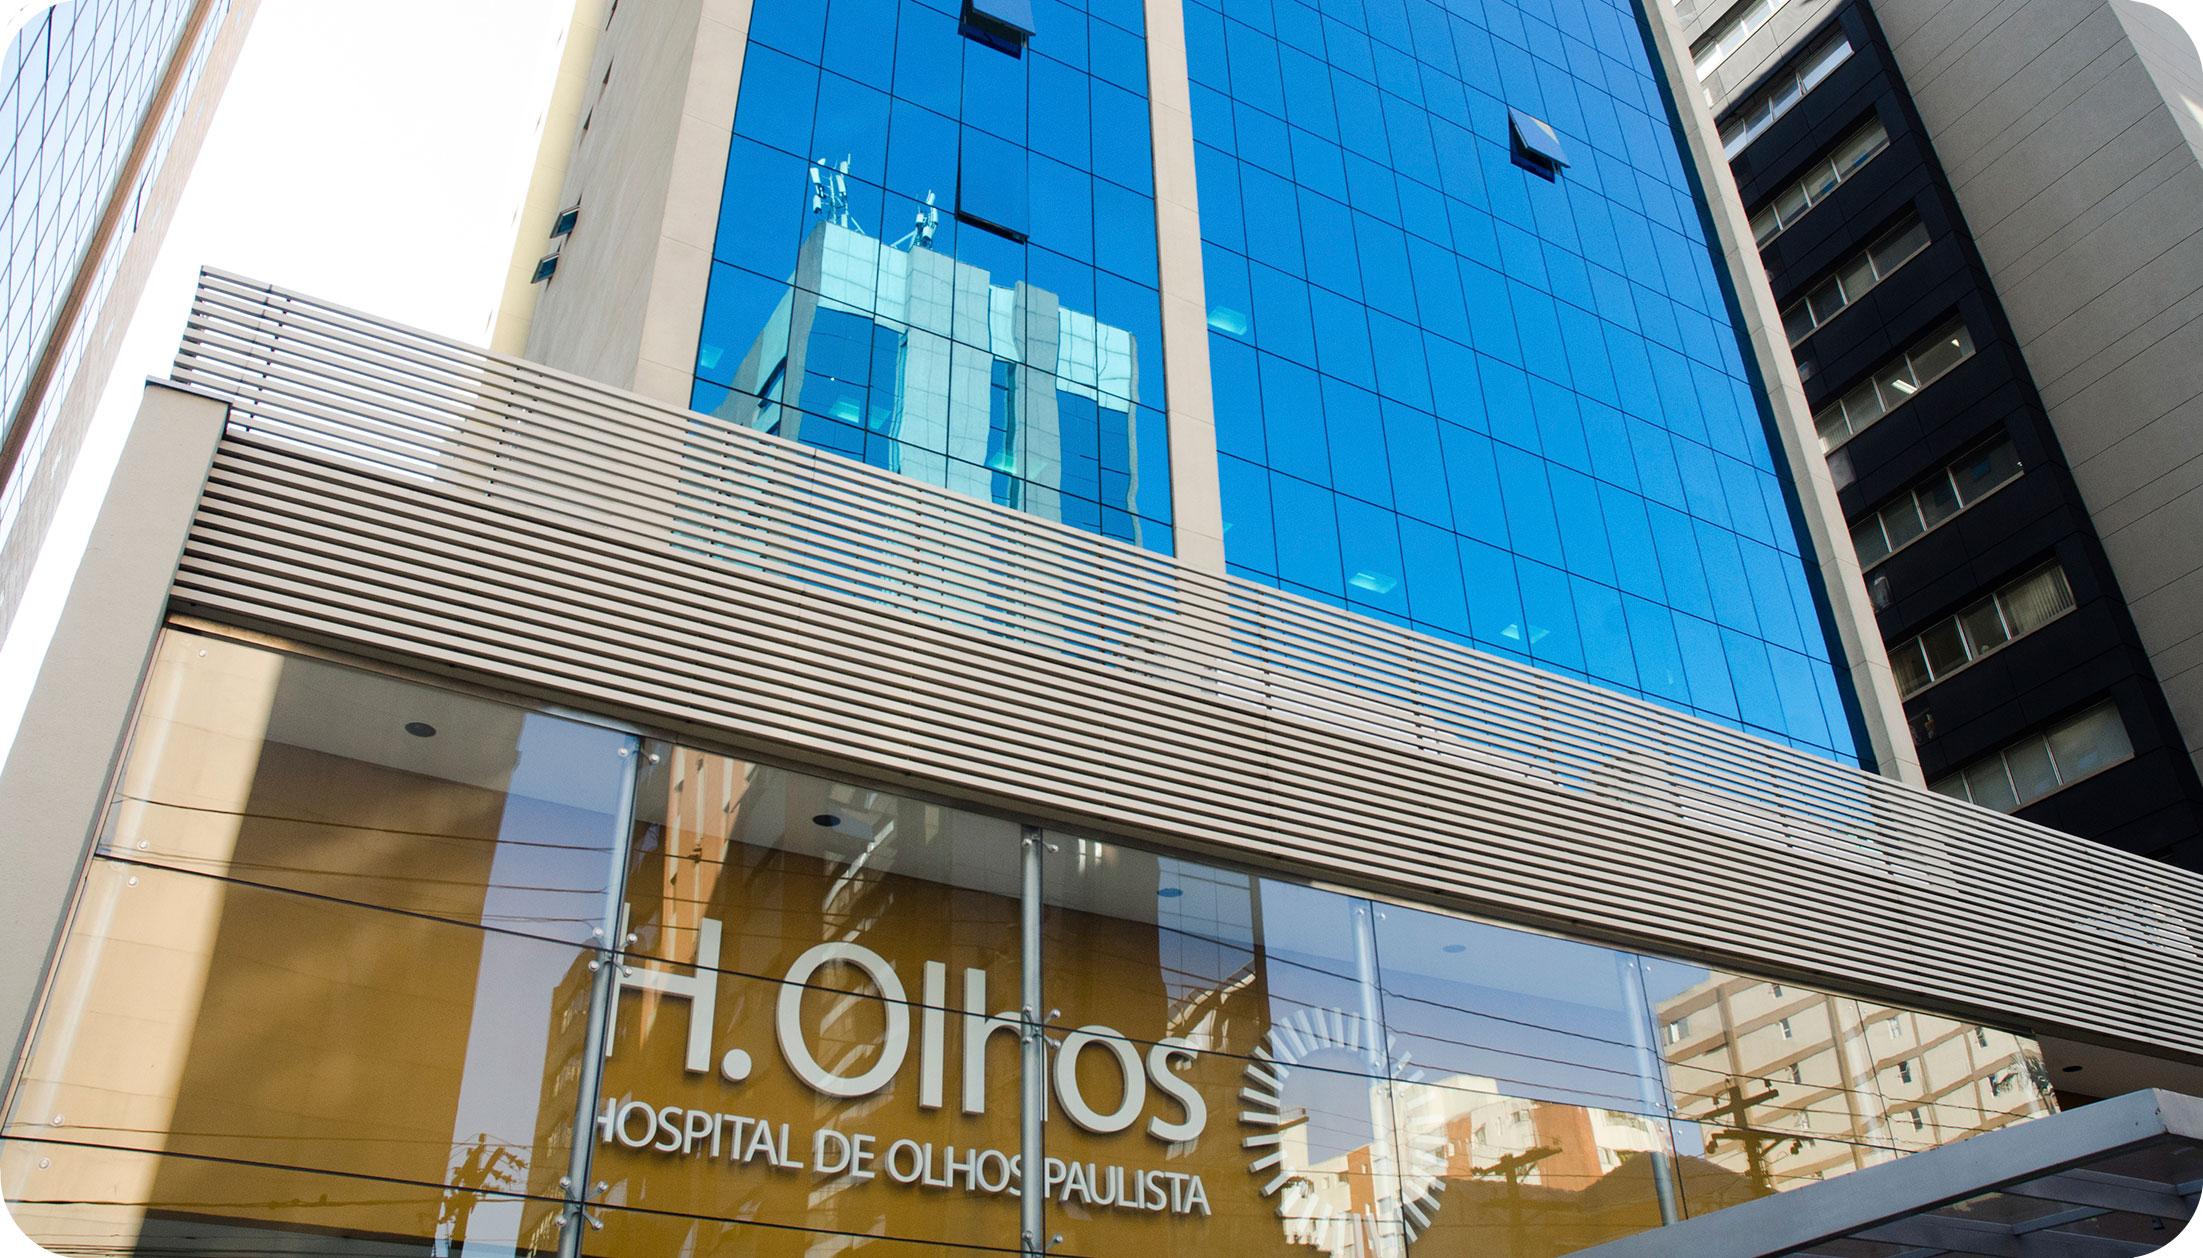 H.Olhos | Hospital de Olhos Paulista